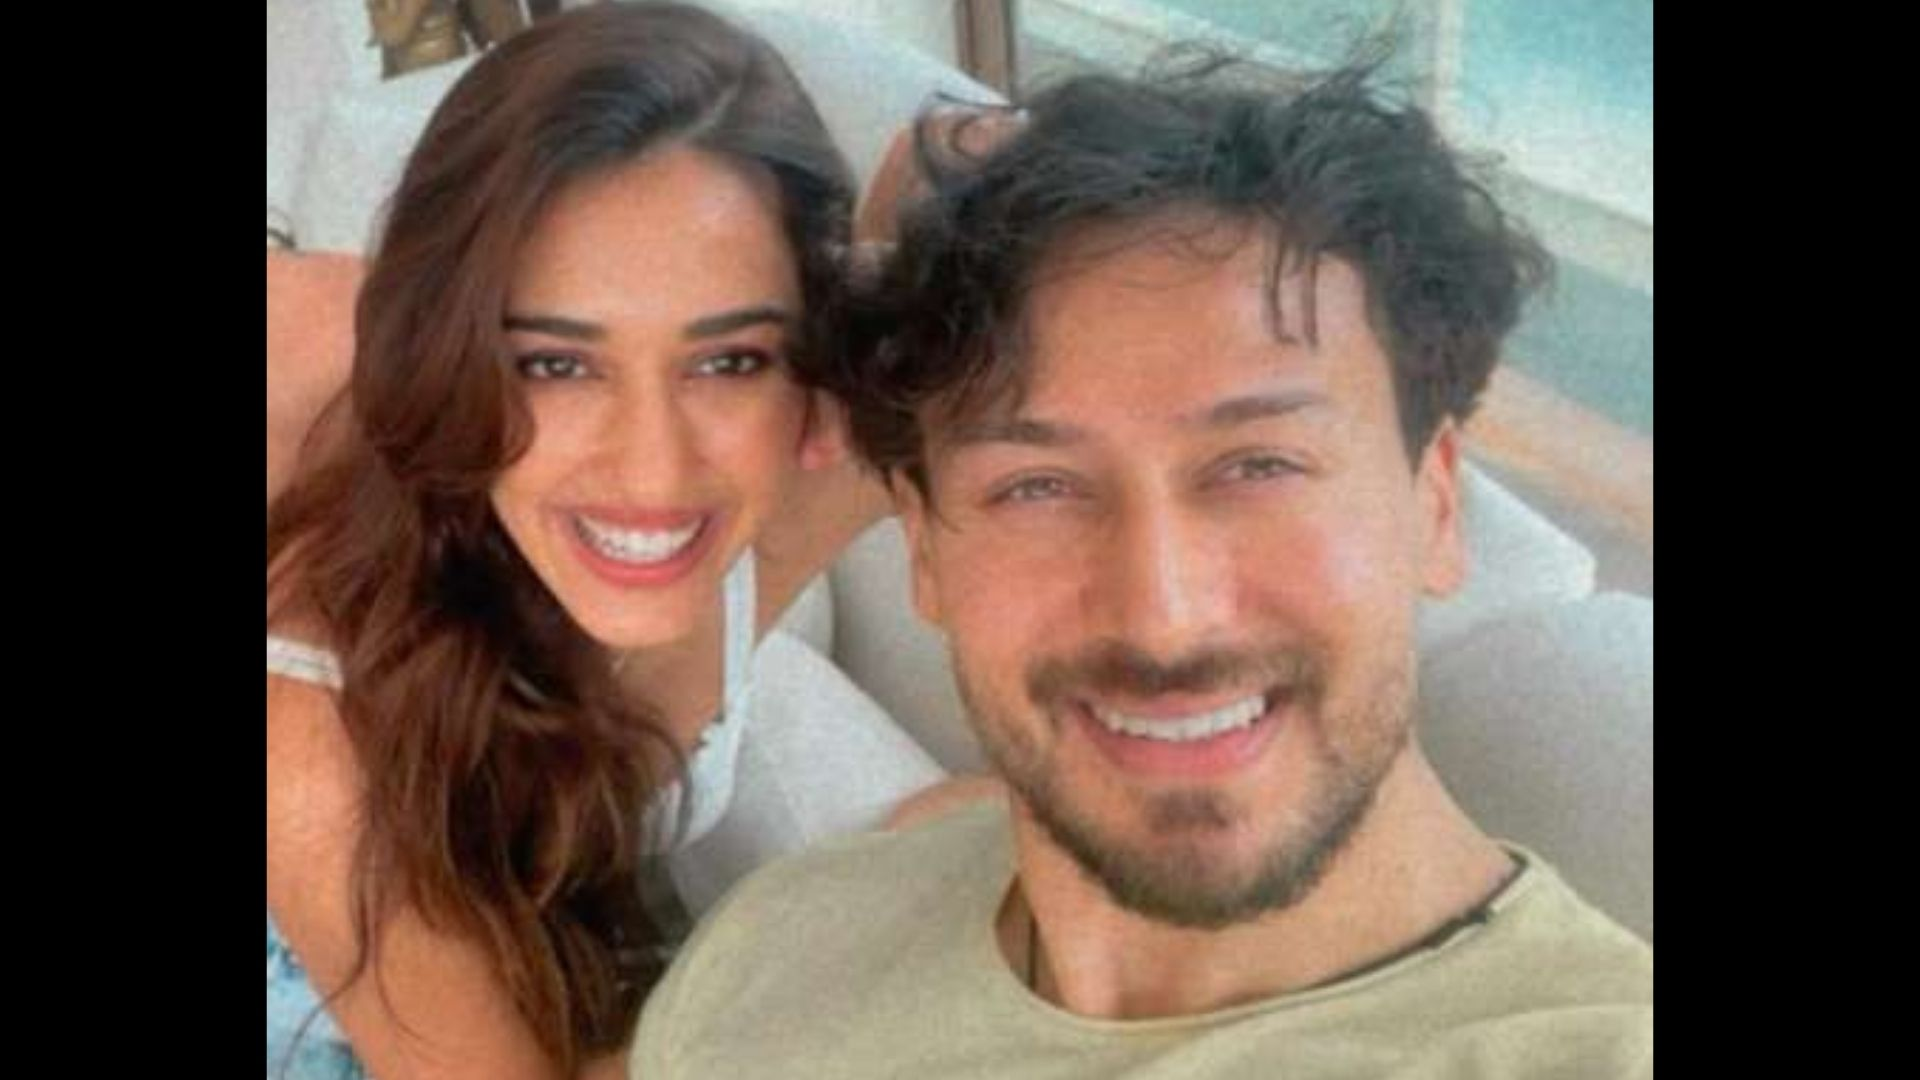 Disha Patani Gives Rumored Boyfriend Tiger Shroff A 'No Make-up Make-up Look'; The Actor Shares A Selfie